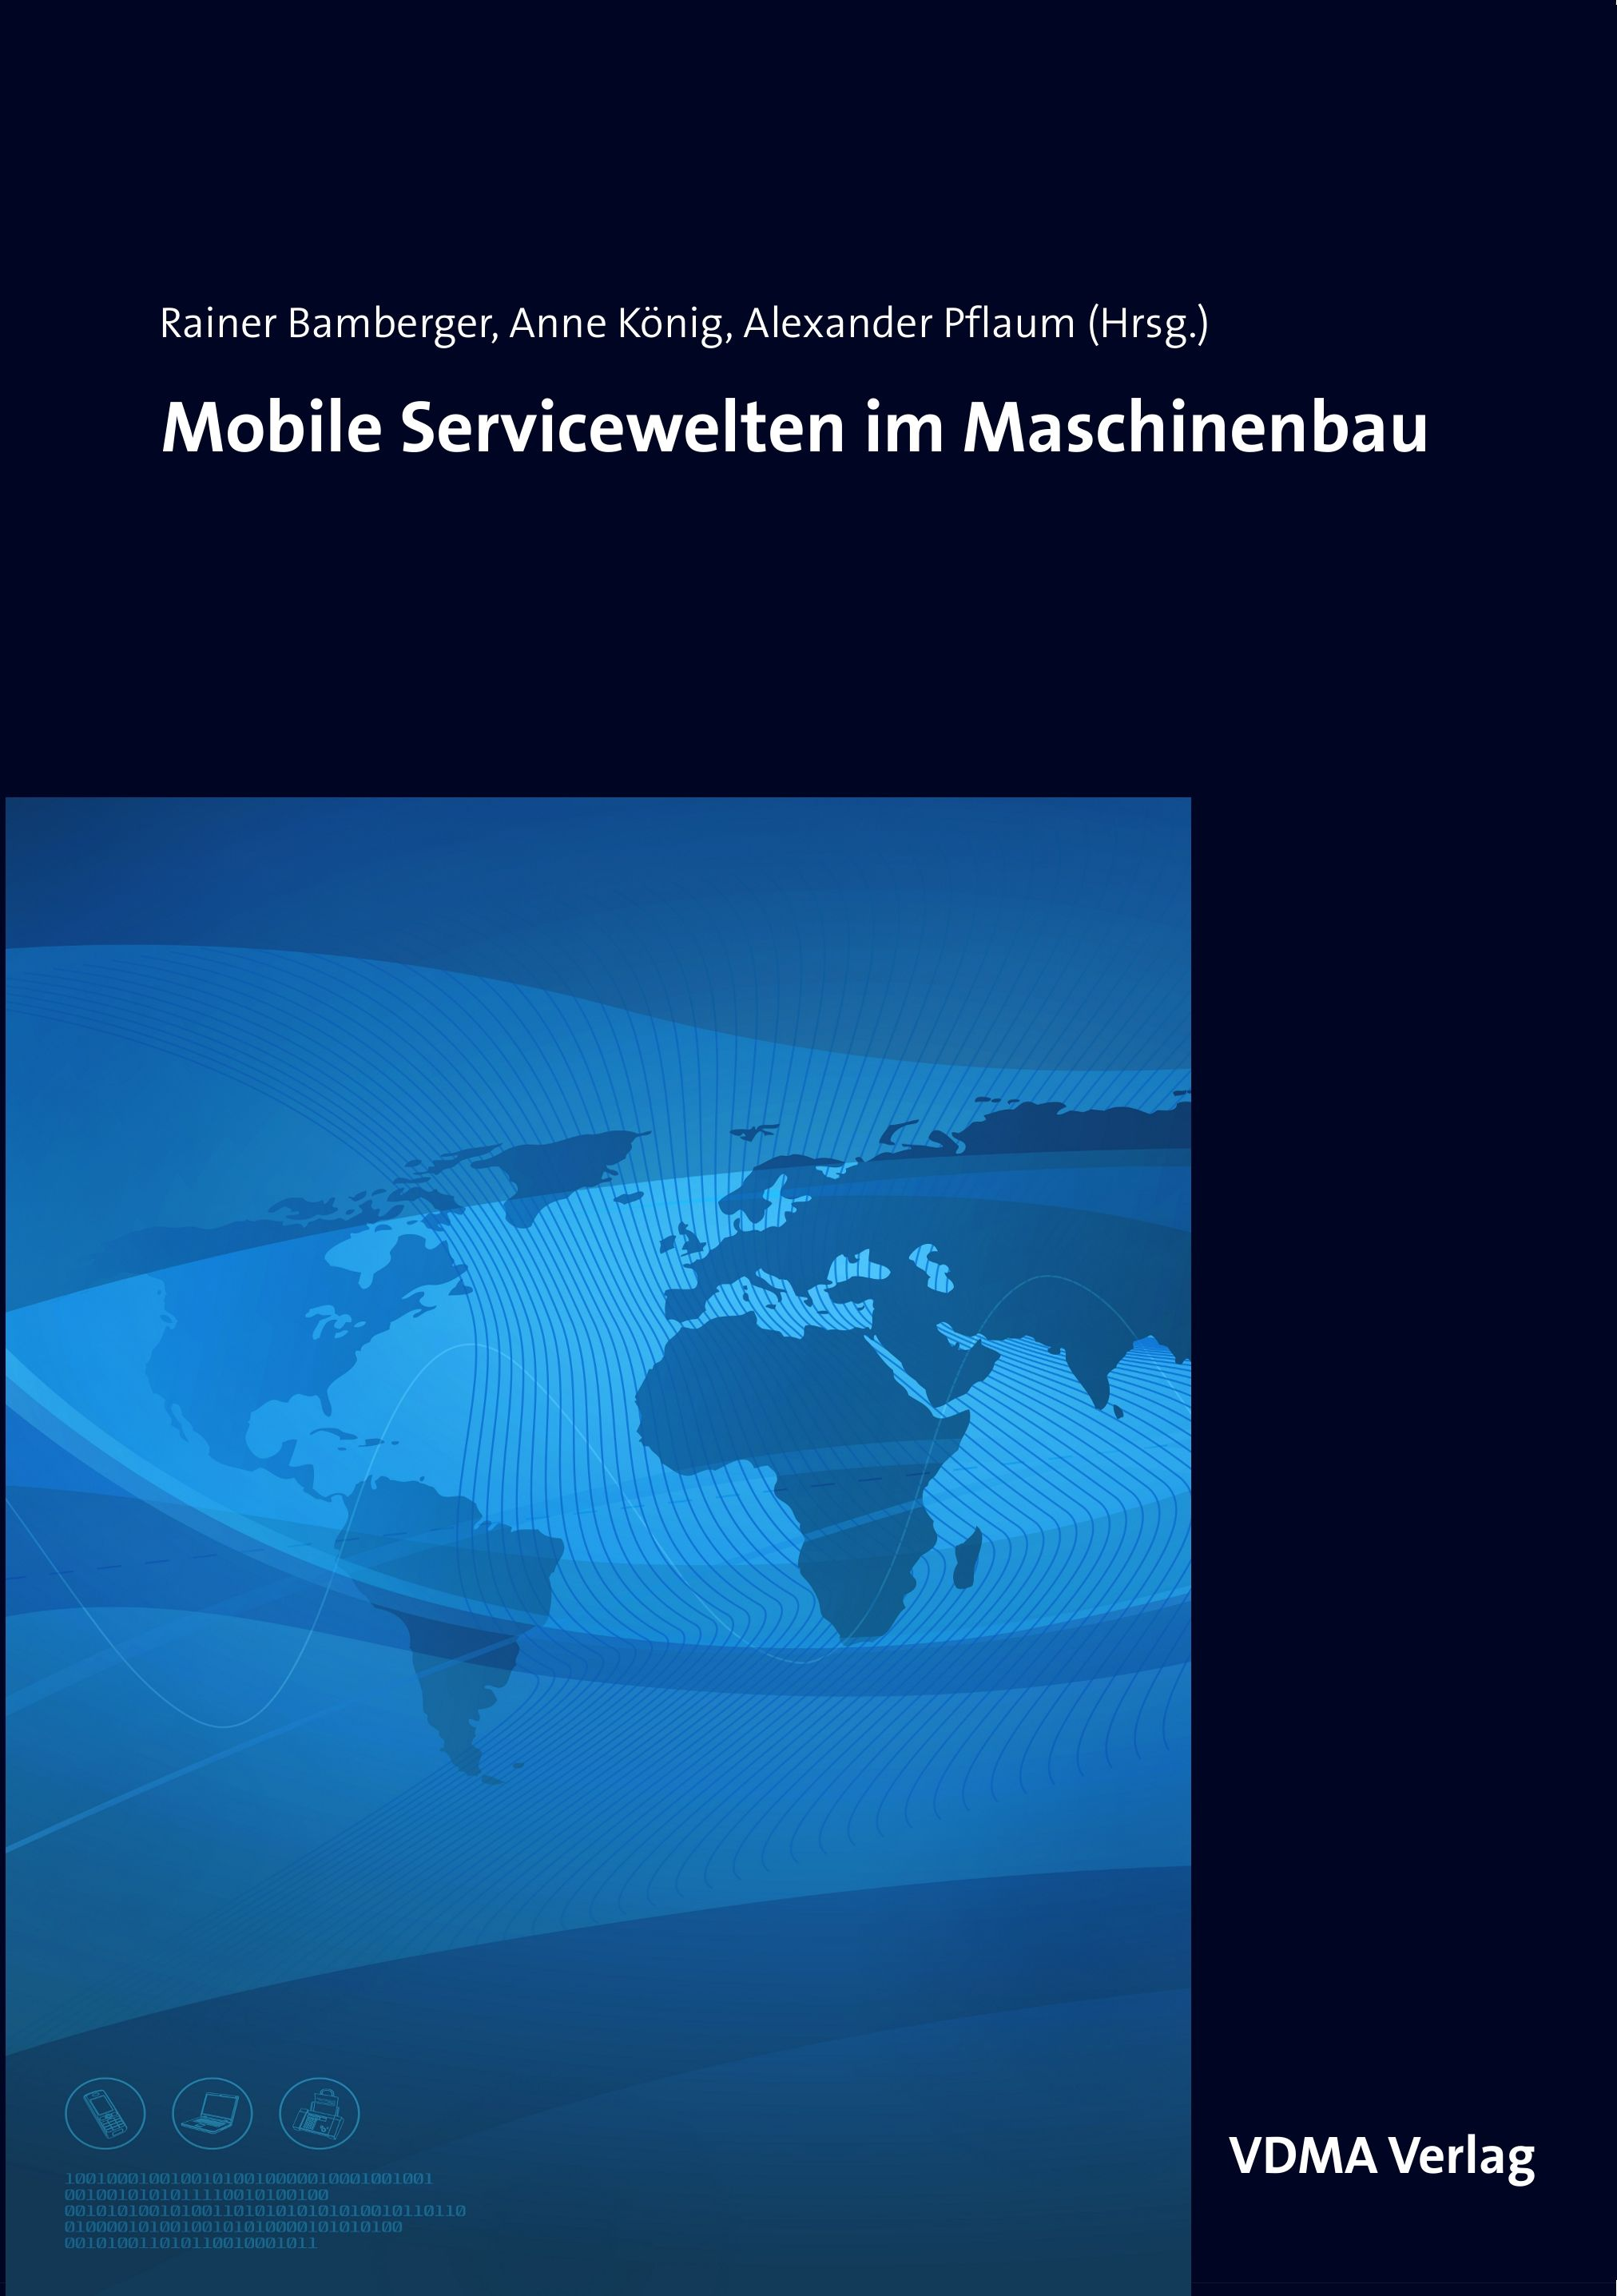 Mobile Servicewelten im Maschinenbau Bamberger, Rainer König, Anne Pflaum, Ale..